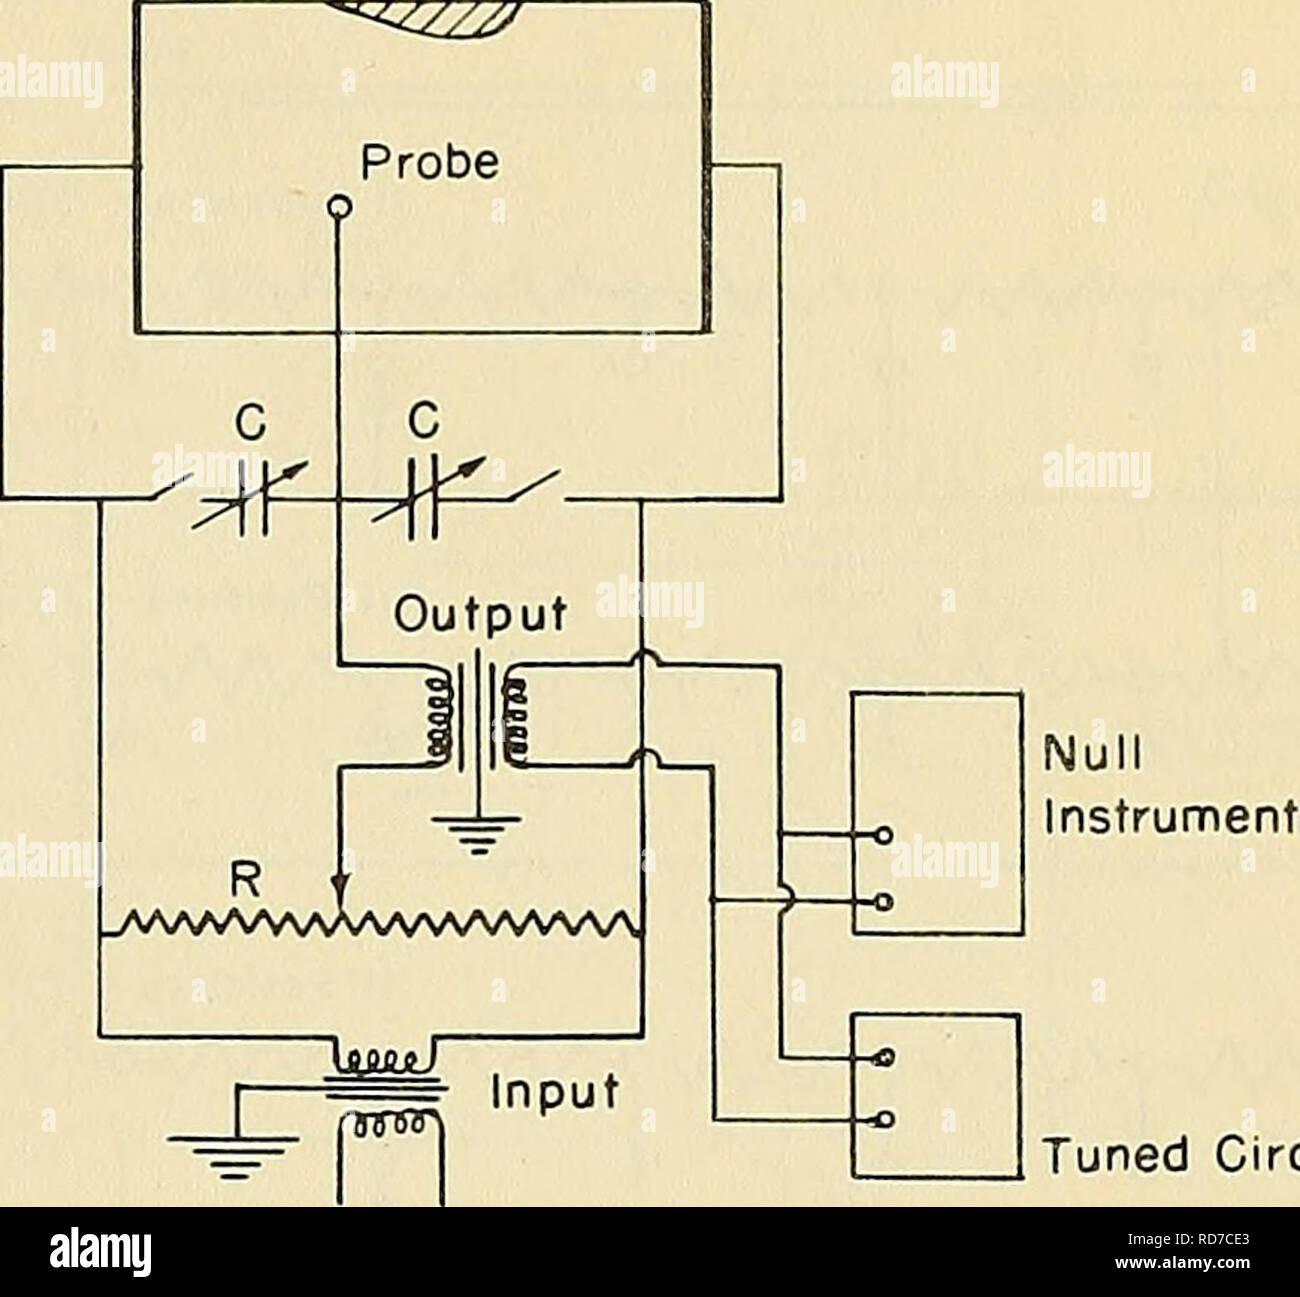 Cb Mic Schematic | Machine Repair Manual  Pin Cb Wiring Diagram on